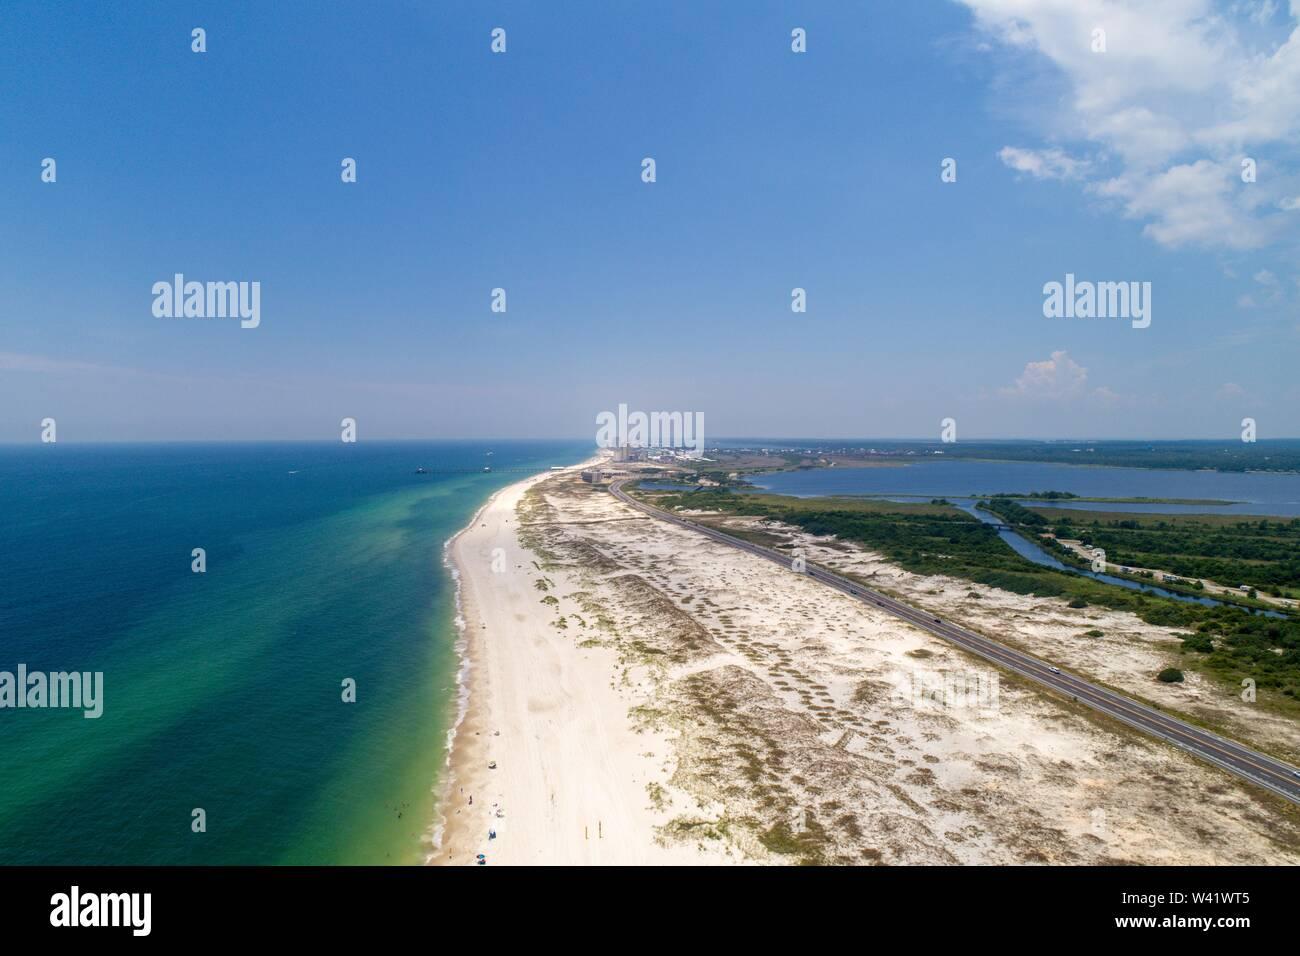 Gulf Shores Beach, Alabama Stock Photo